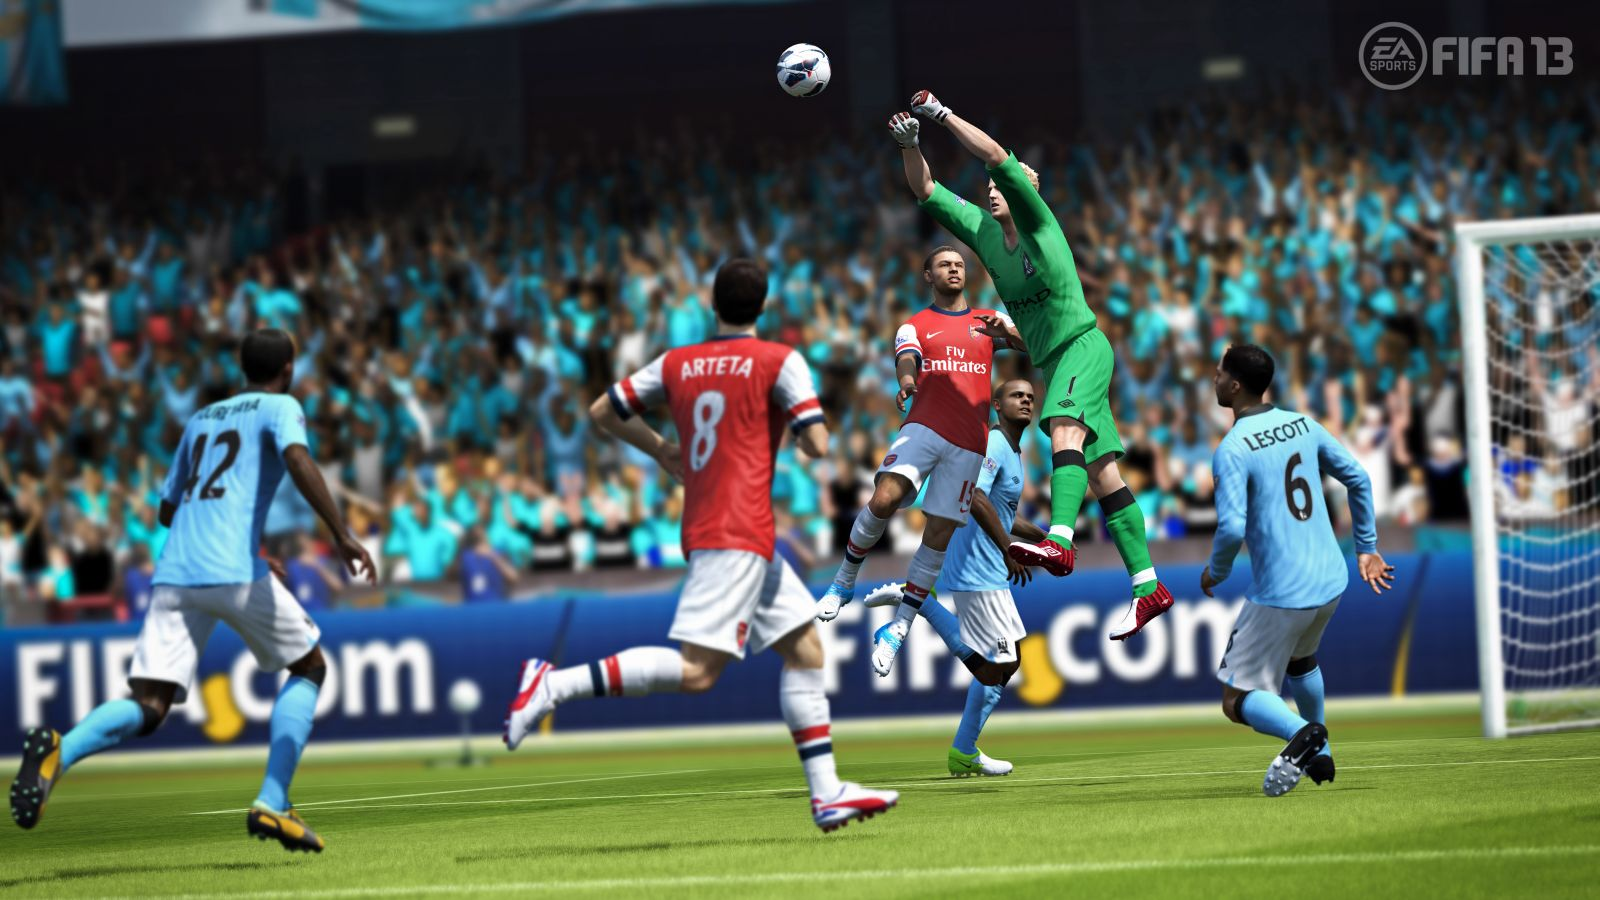 FIFA 13: dojmy z prezentace z Edenu 68888